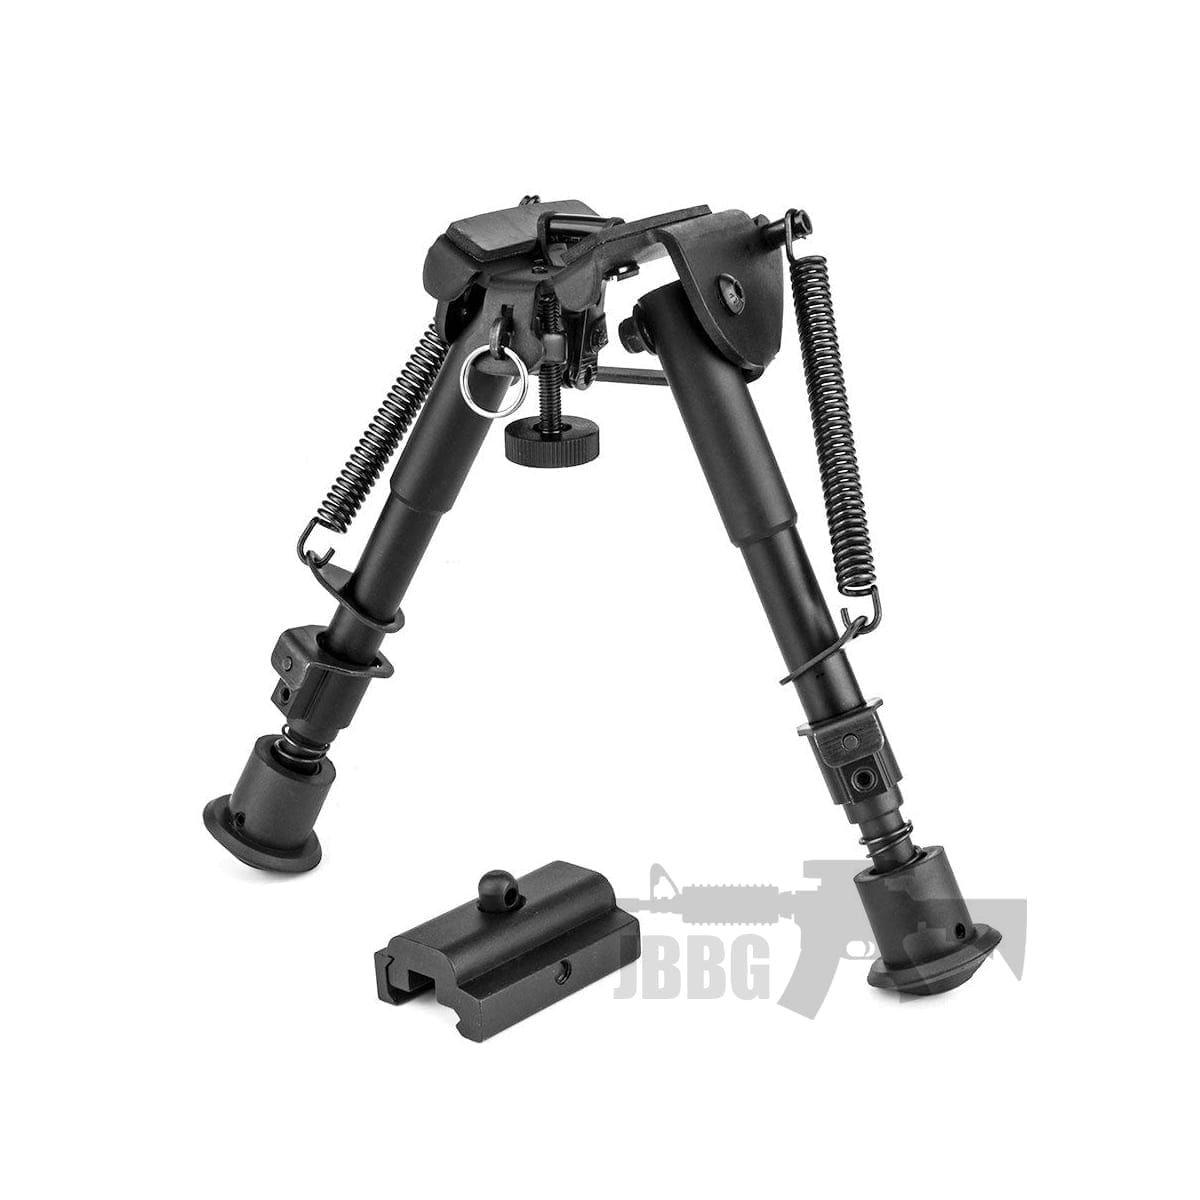 PRO BIPOD sniper mount retractable rifle